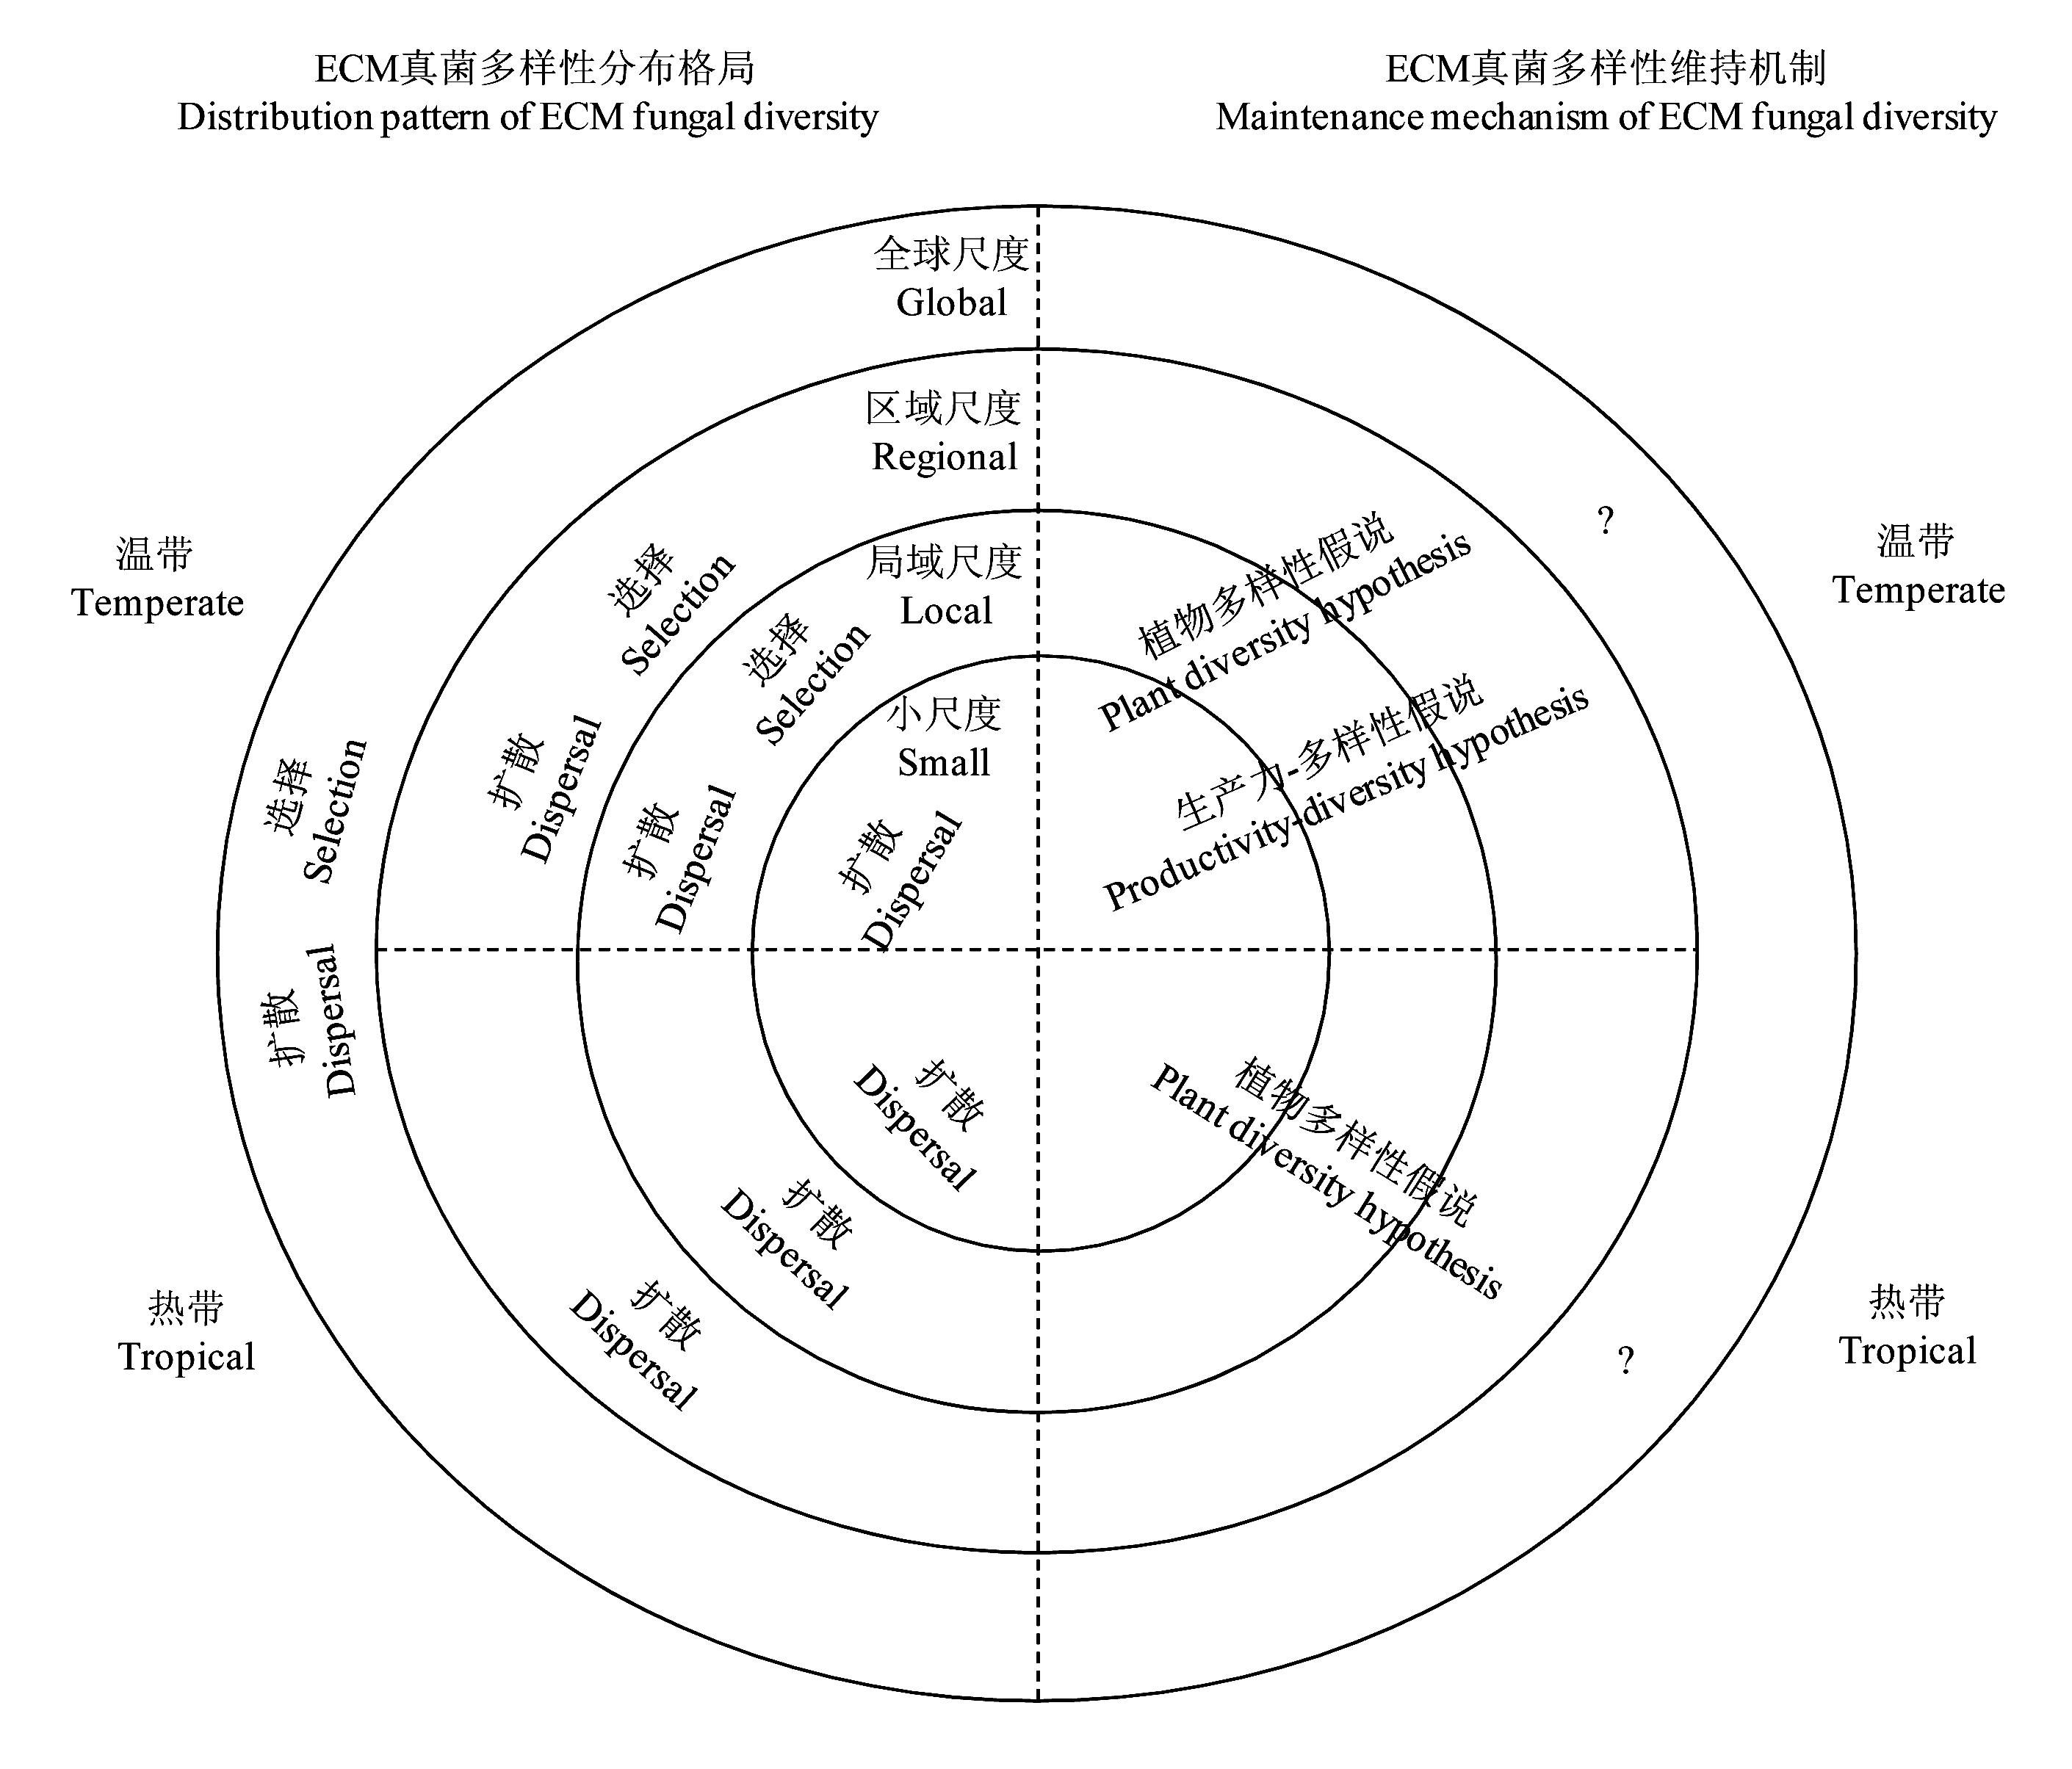 Distribution pattern and maintenance of ectomycorrhizal